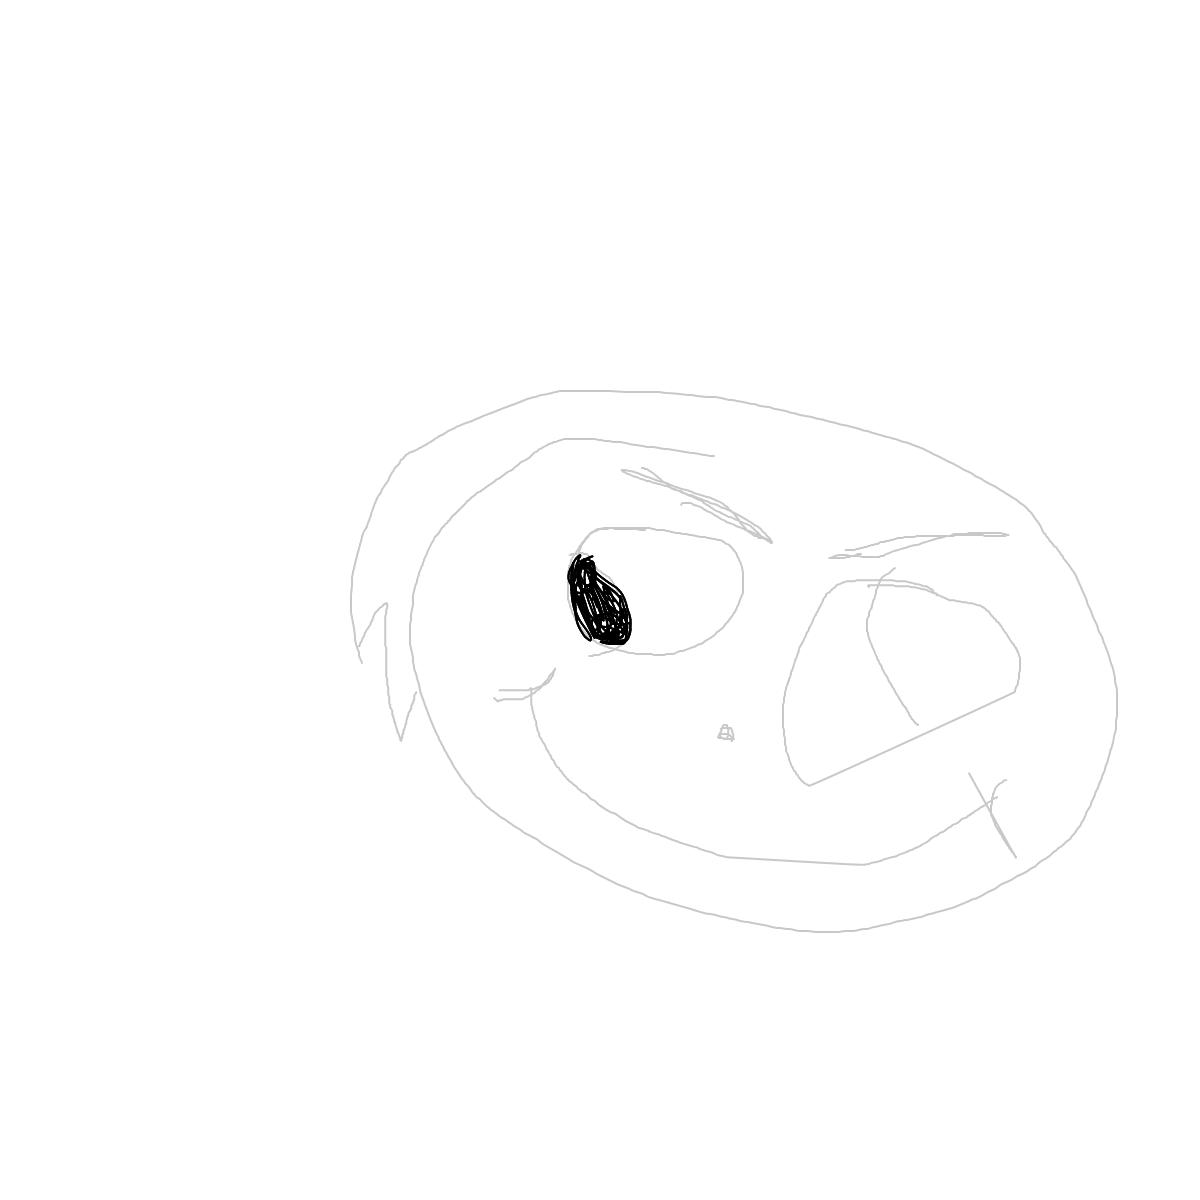 BAAAM drawing#2670 lat:63.5731658935546900lng: 37.9268035888671900